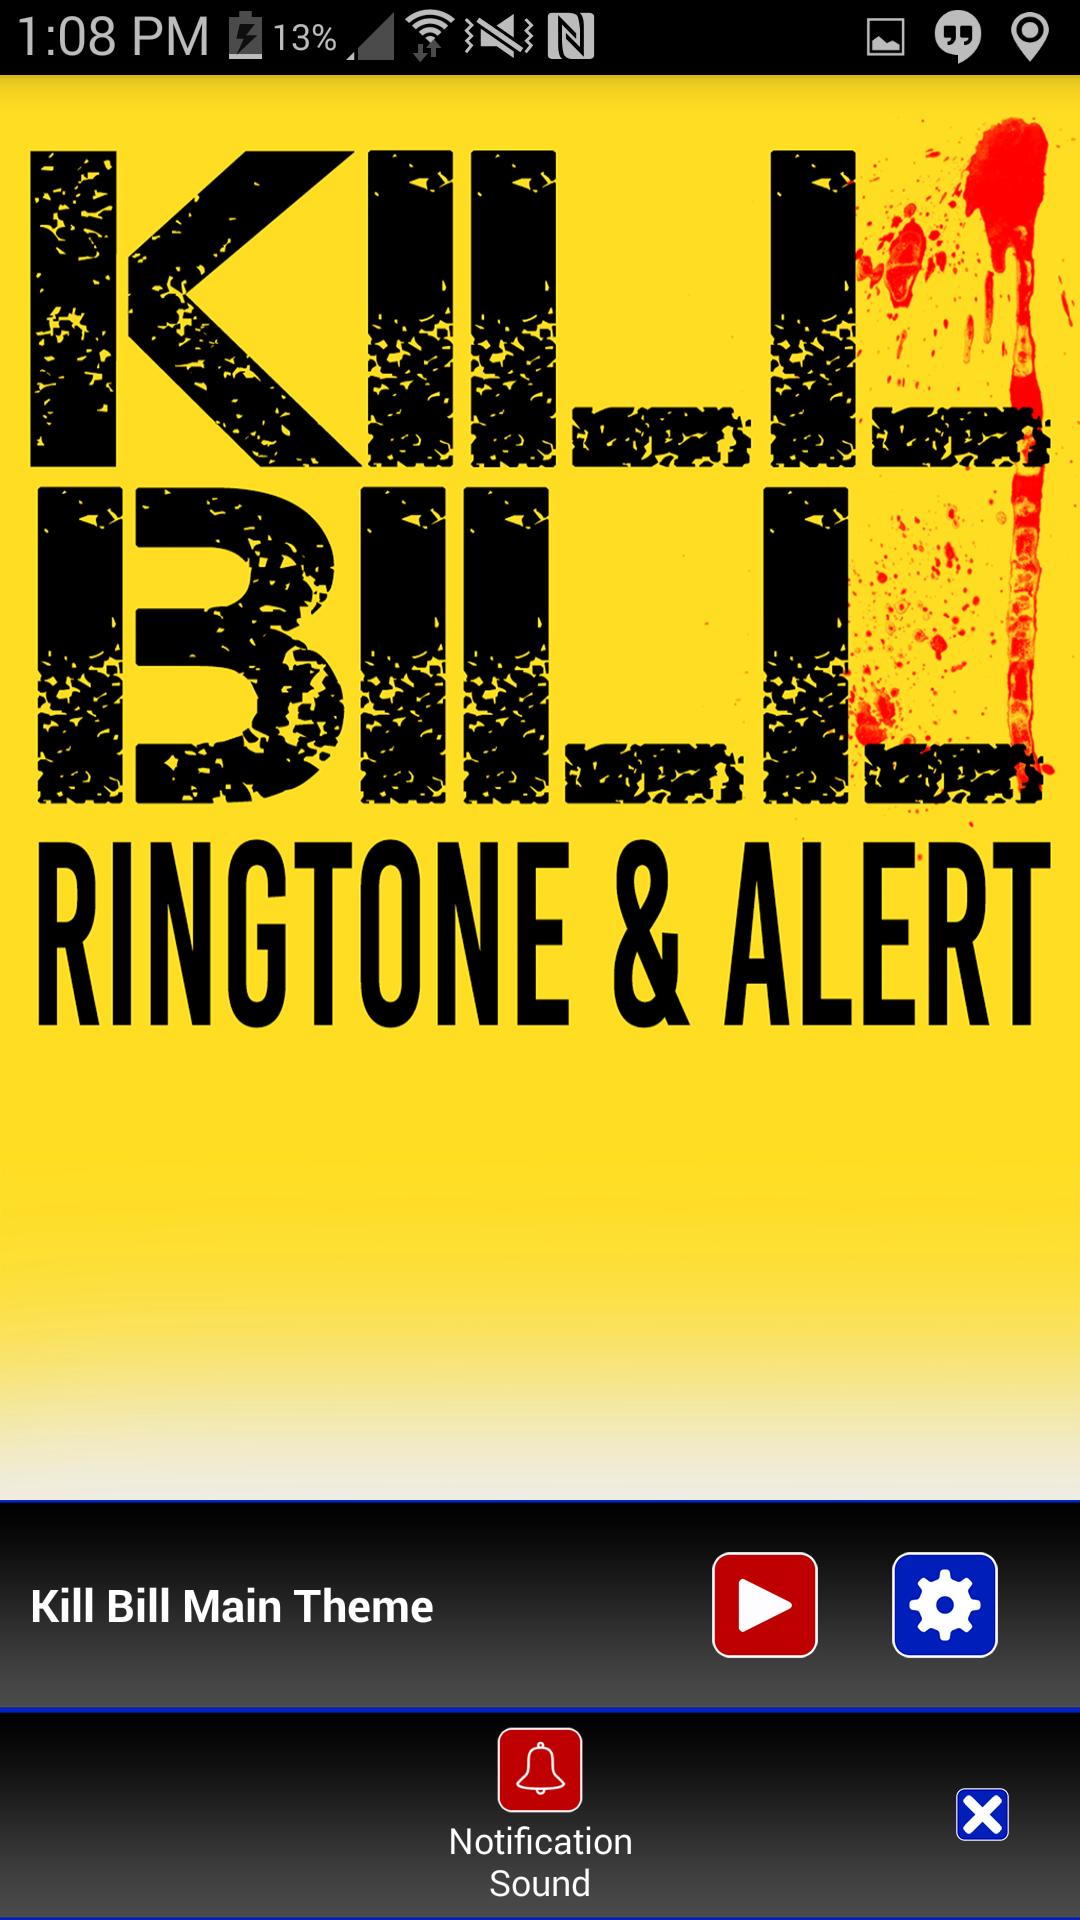 kill bill whistle ringtone iphone 7